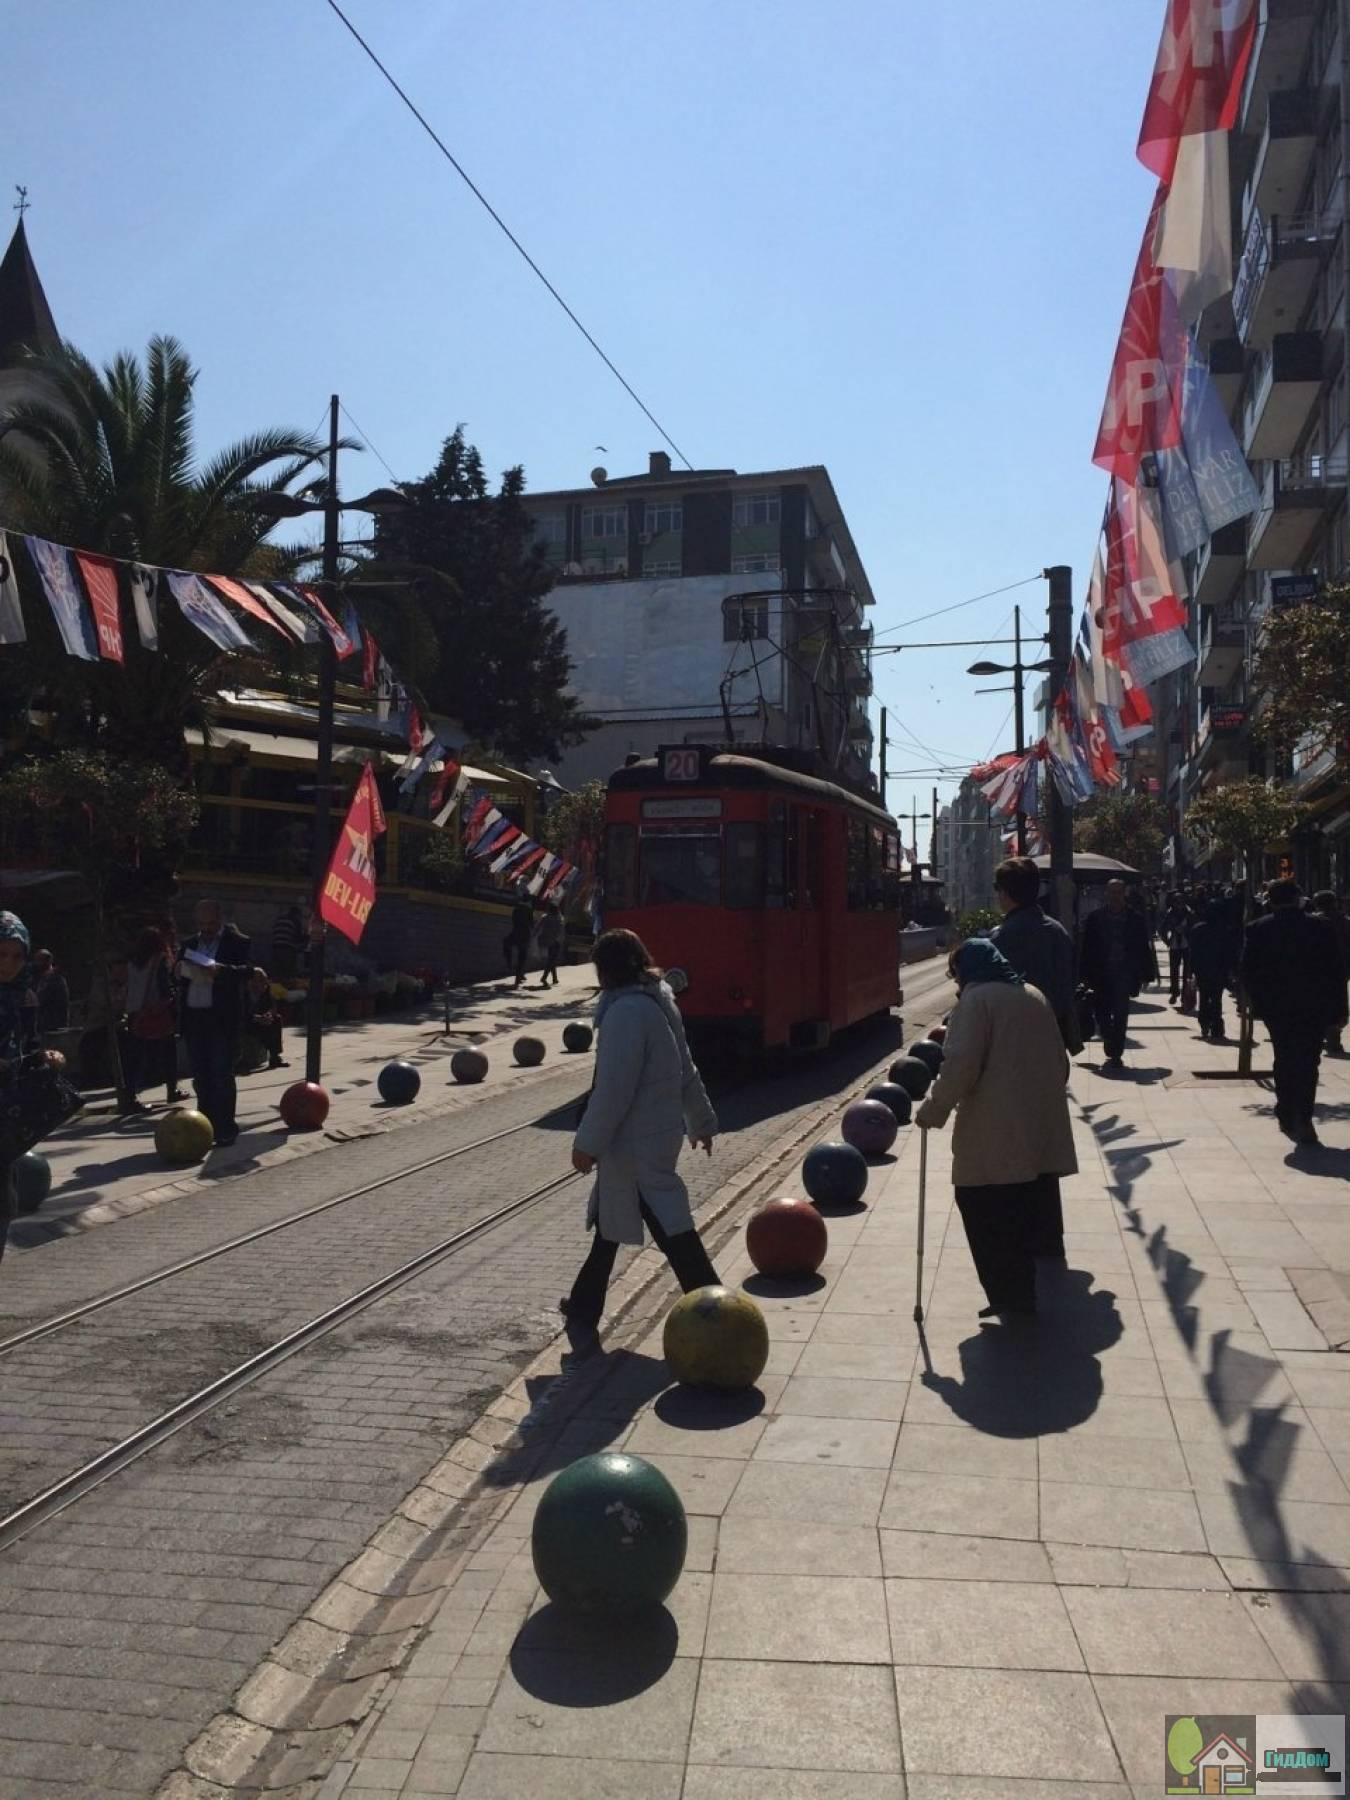 Трамвай на улице Бахарие в Стамбуле. Снимок загружен из открытых источников. Автор снимка tashka-tashka2007.